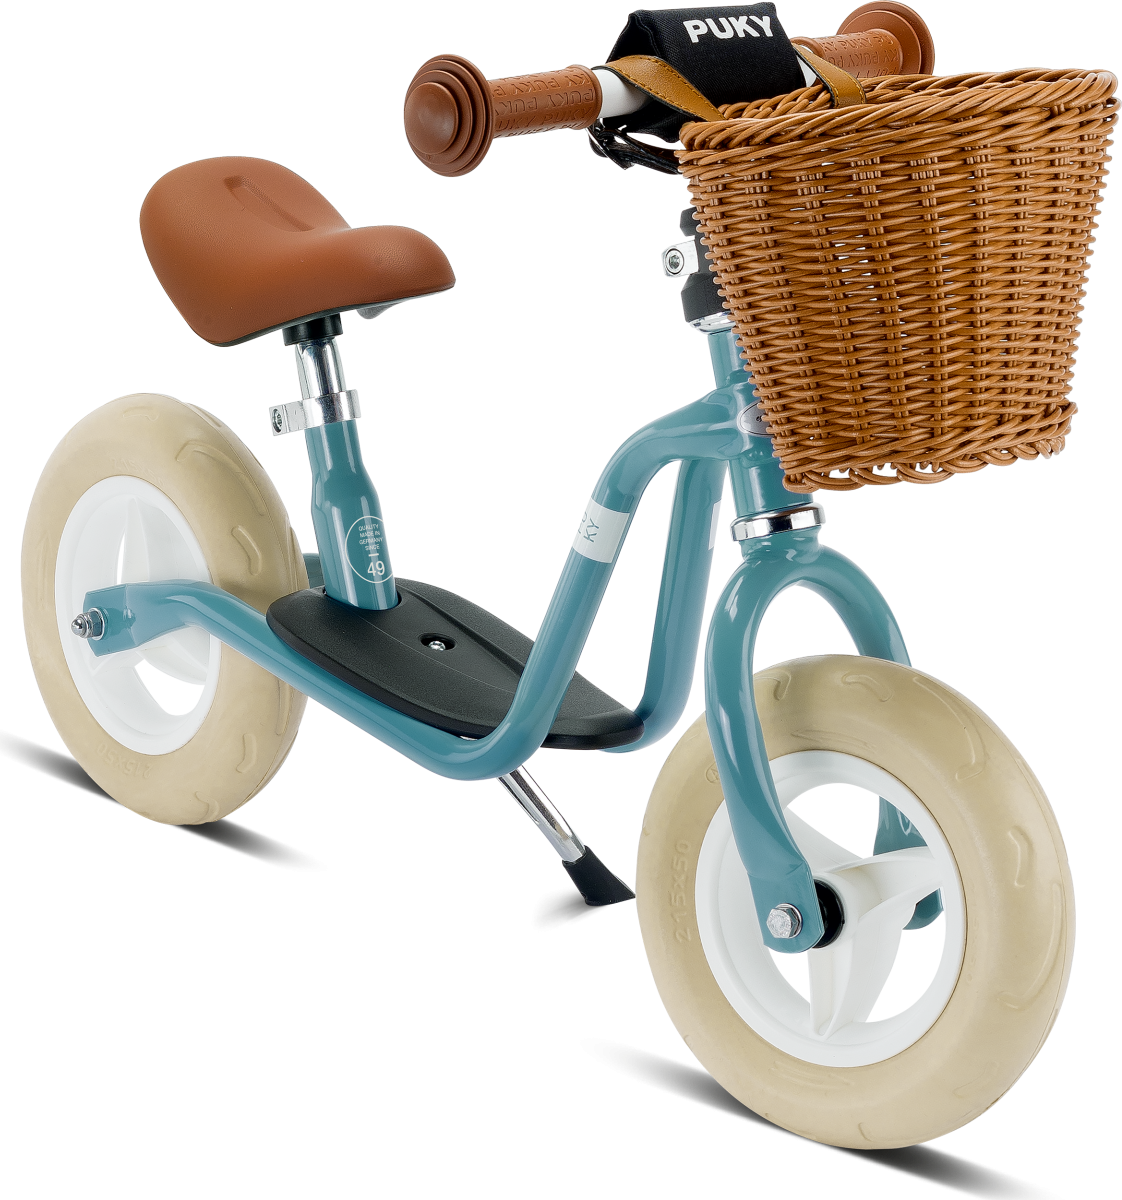 Puky LR M CLASSIC Løbecykel - Blå